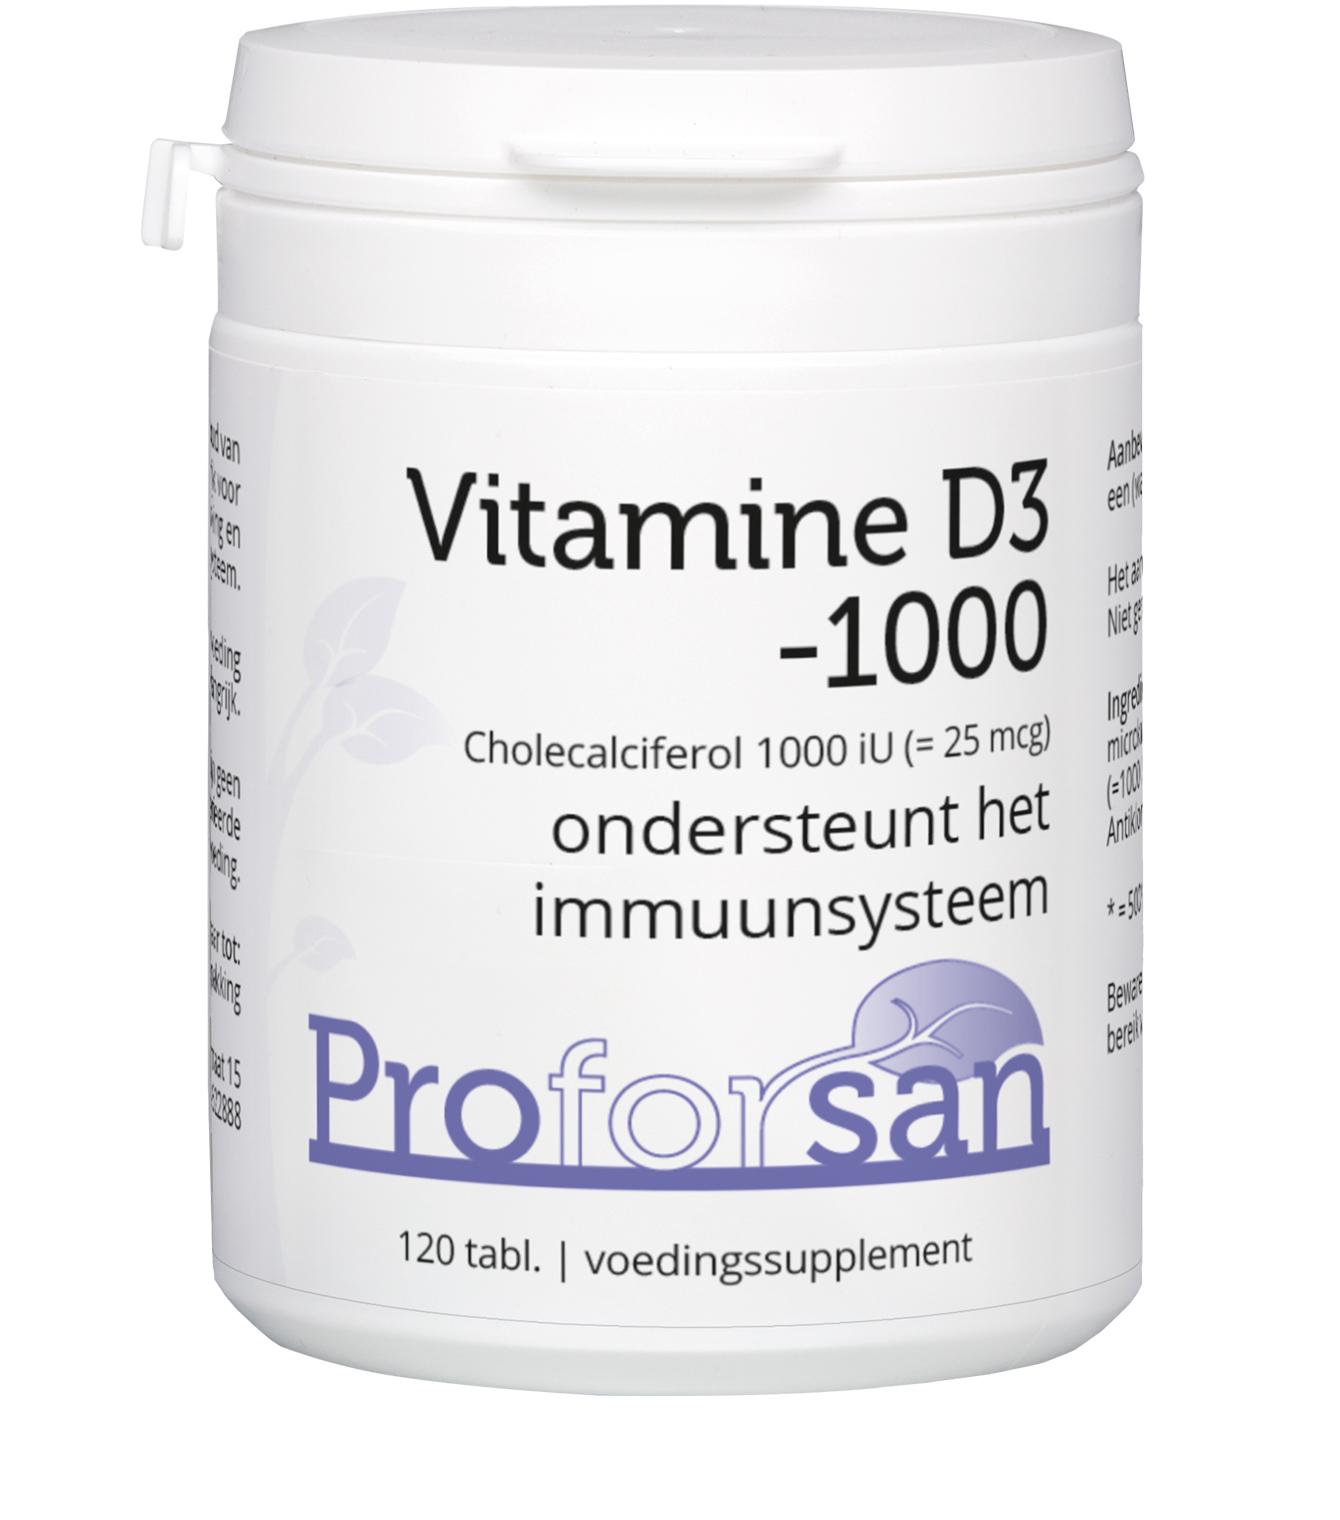 Proforsan Vitamine D3-1000 - 60 tabletten